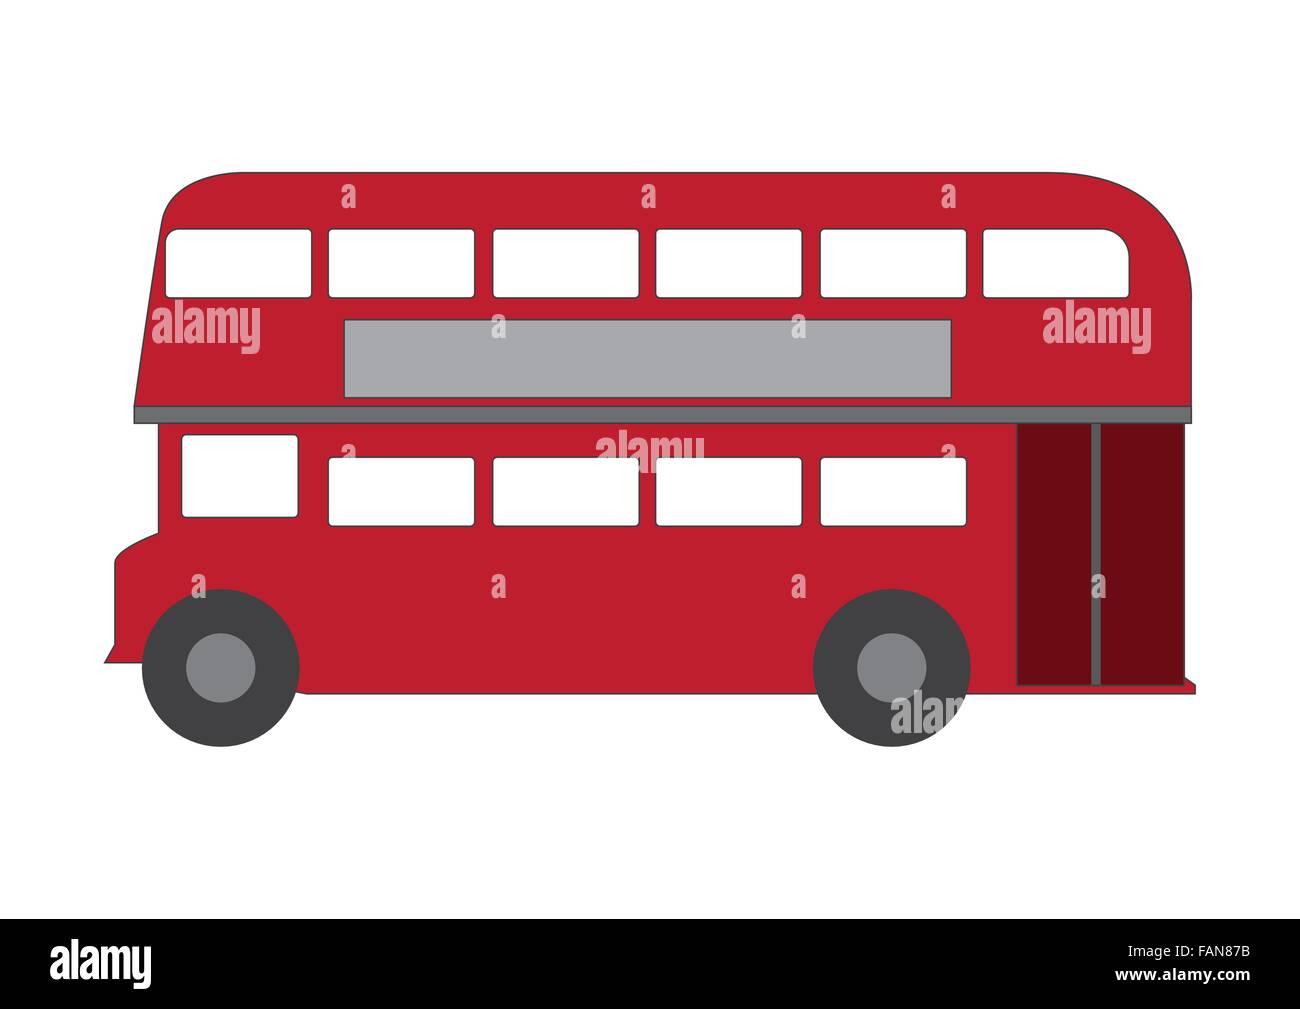 Stylized London double-deck bus on white background - Stock Image